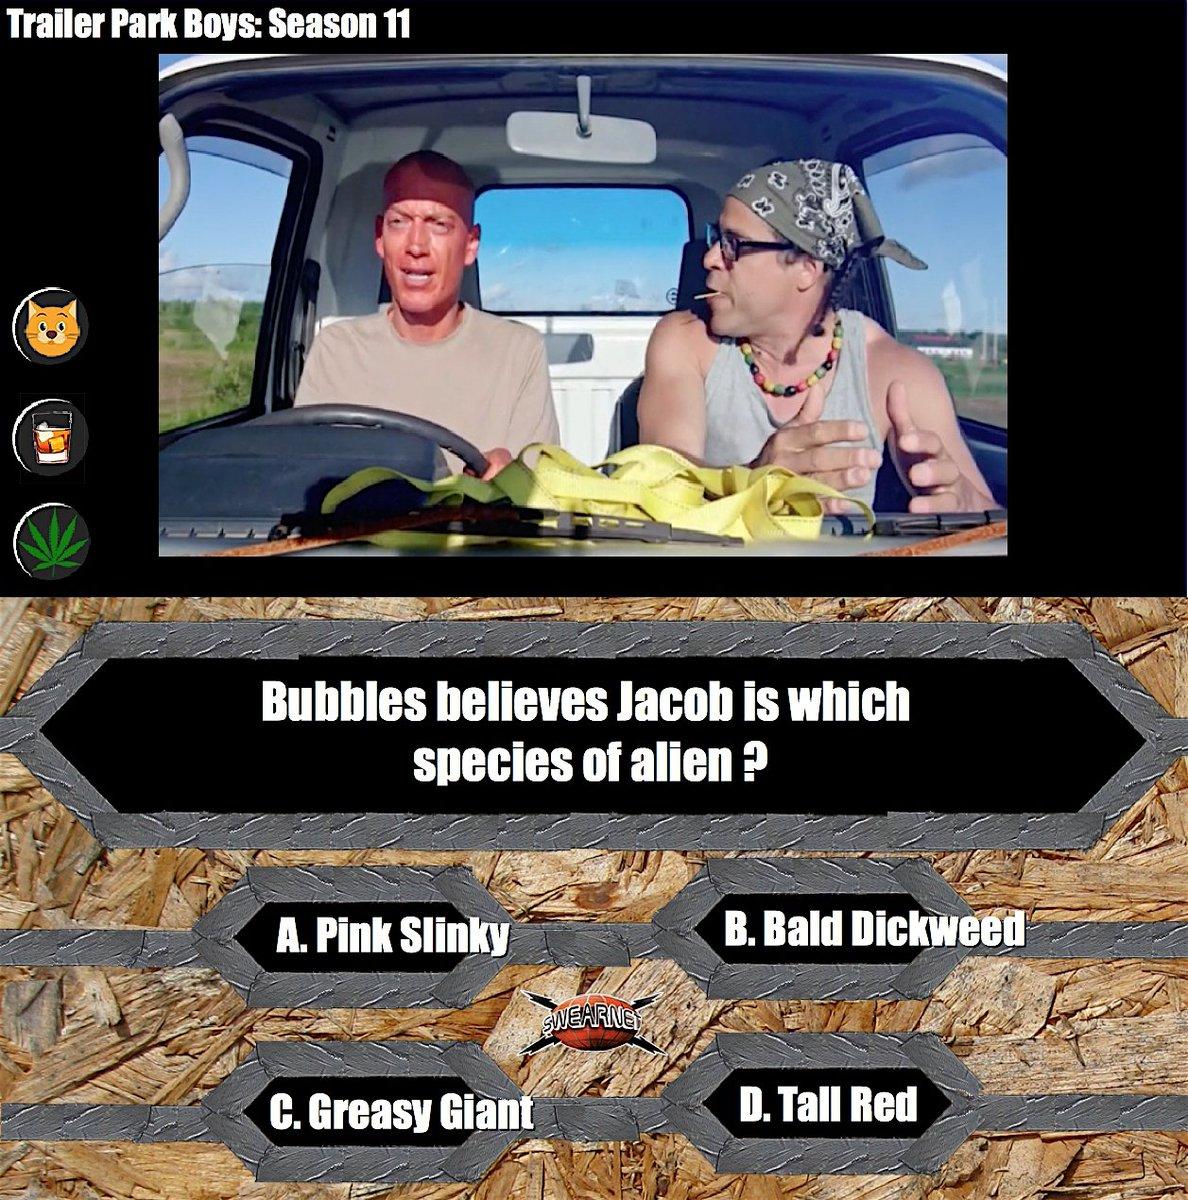 Trailer park boys trivia